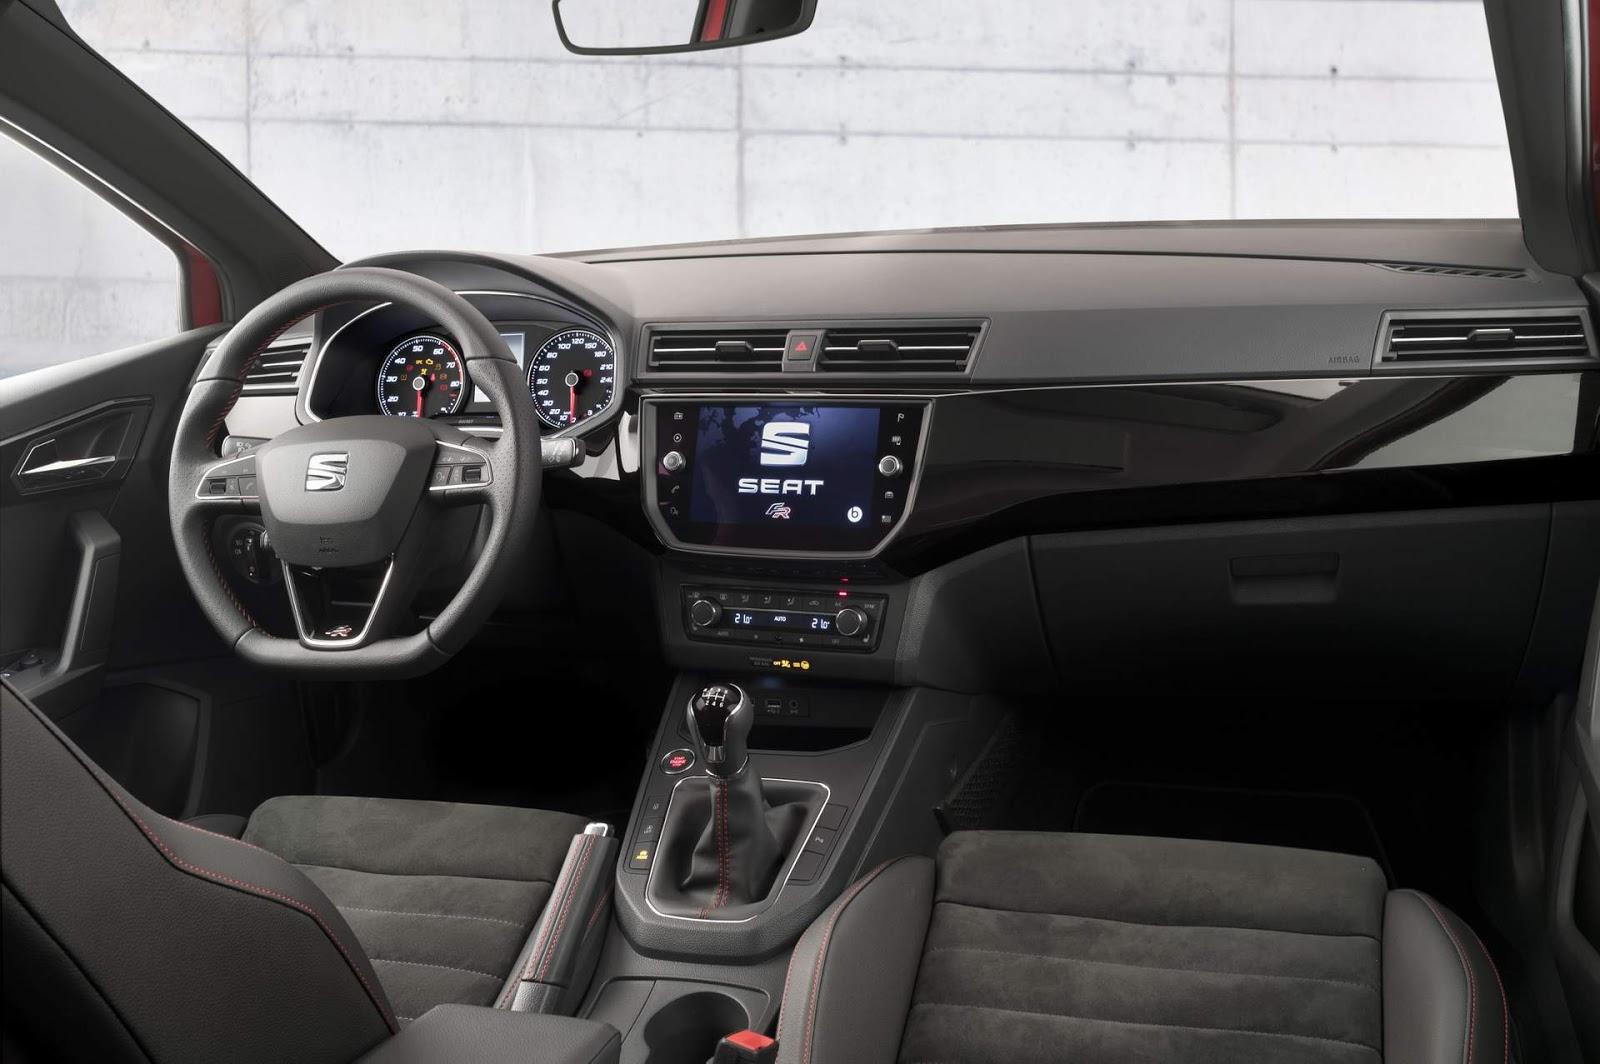 Vw polo ibiza 2018 1 0 tsi desempenho e consumo oficiais for Seat ibiza innenraum